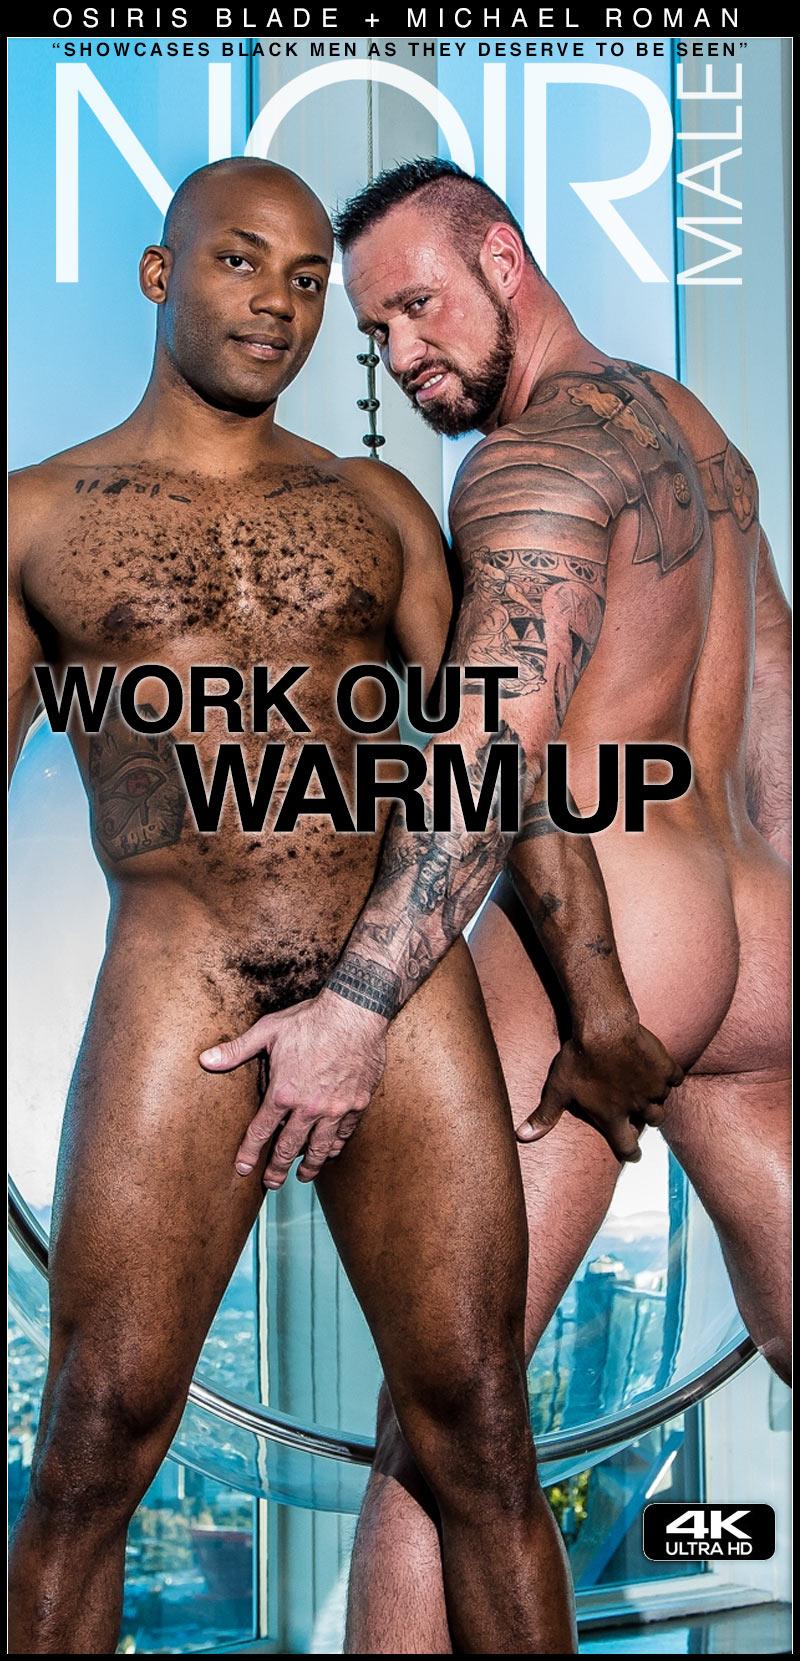 Work Out Warm Up (Osiris Blade Fucks Michael Roman) at Noir Male